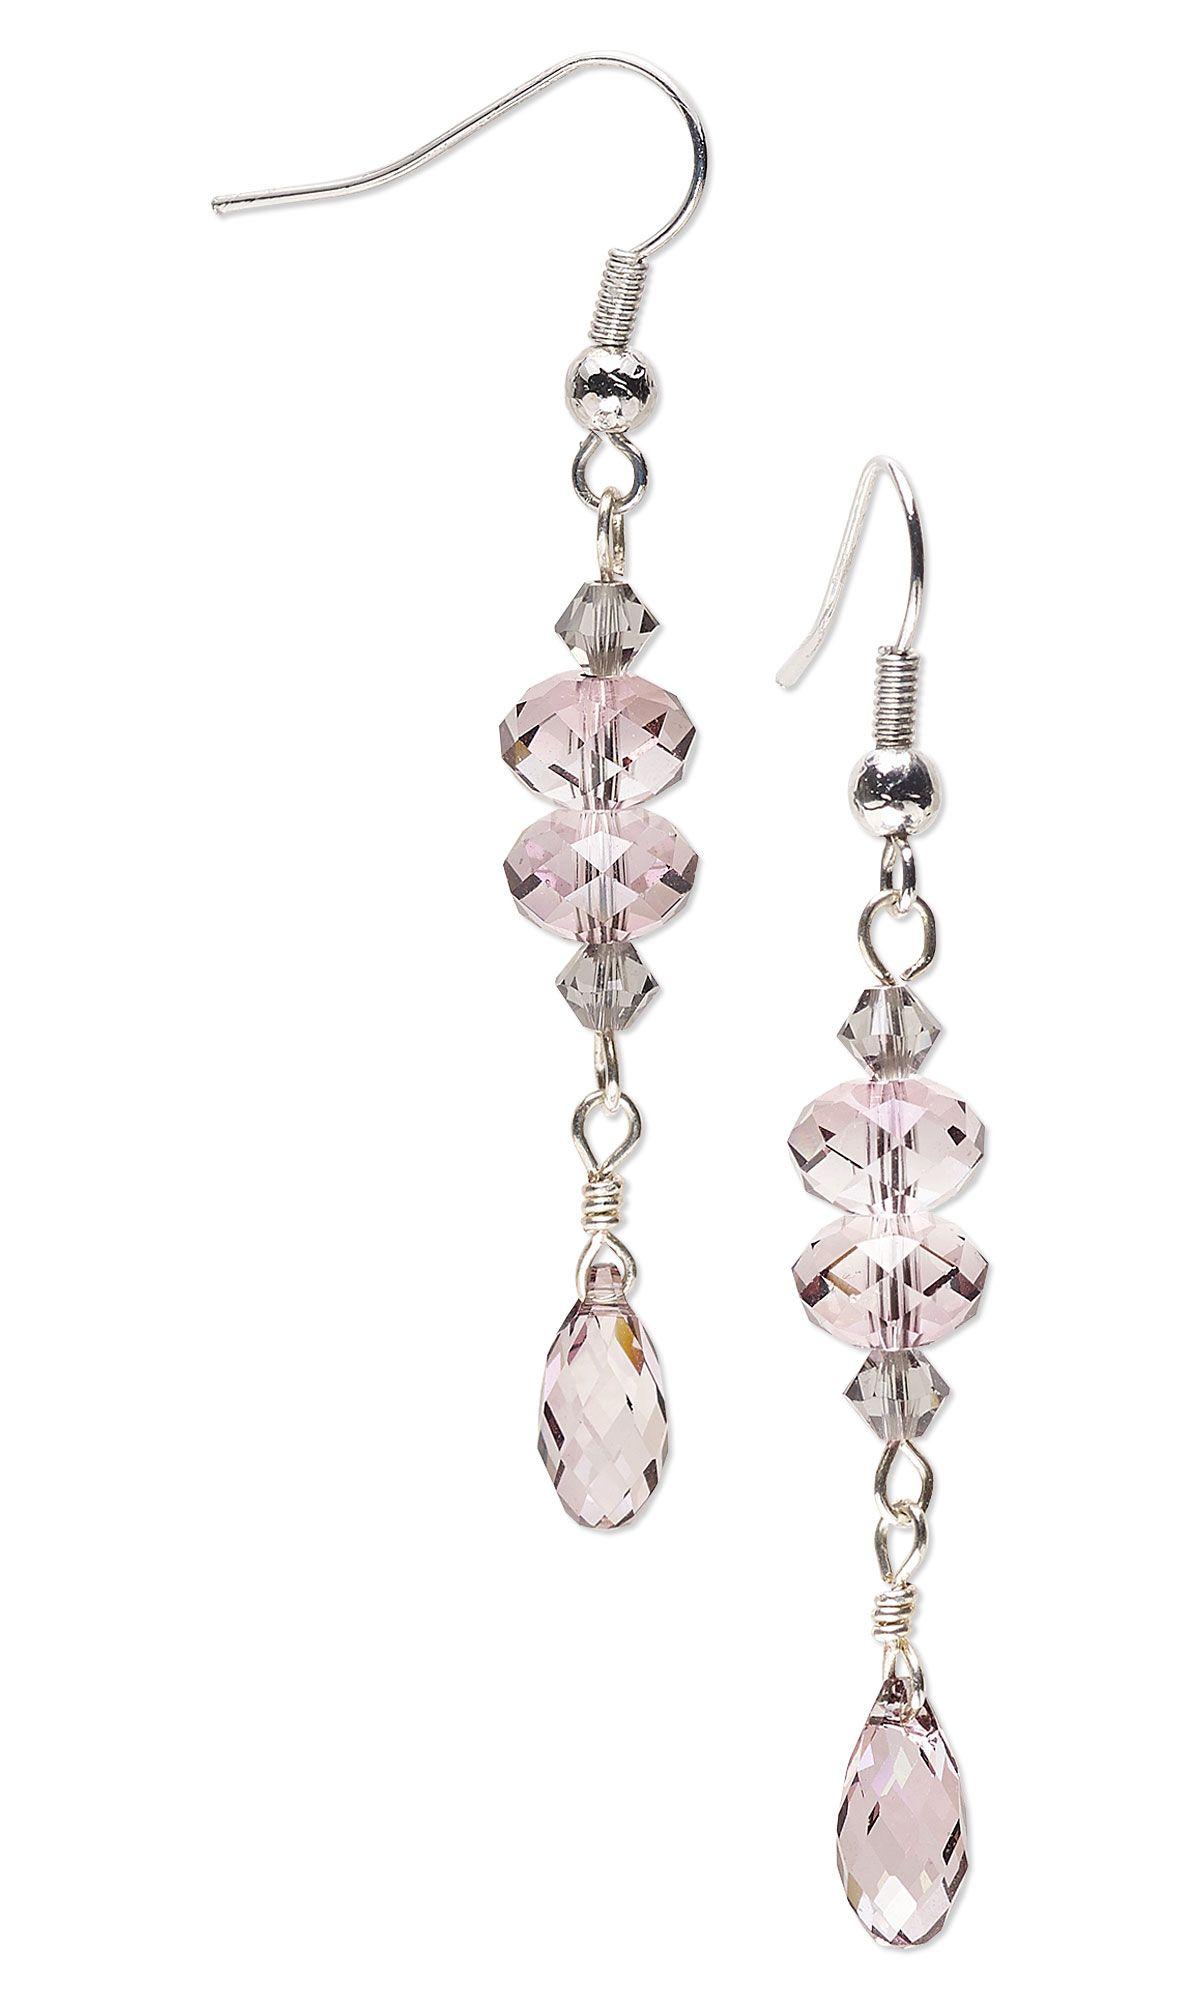 Jewelry Design Earrings with Swarovski Crystal Fire Mountain